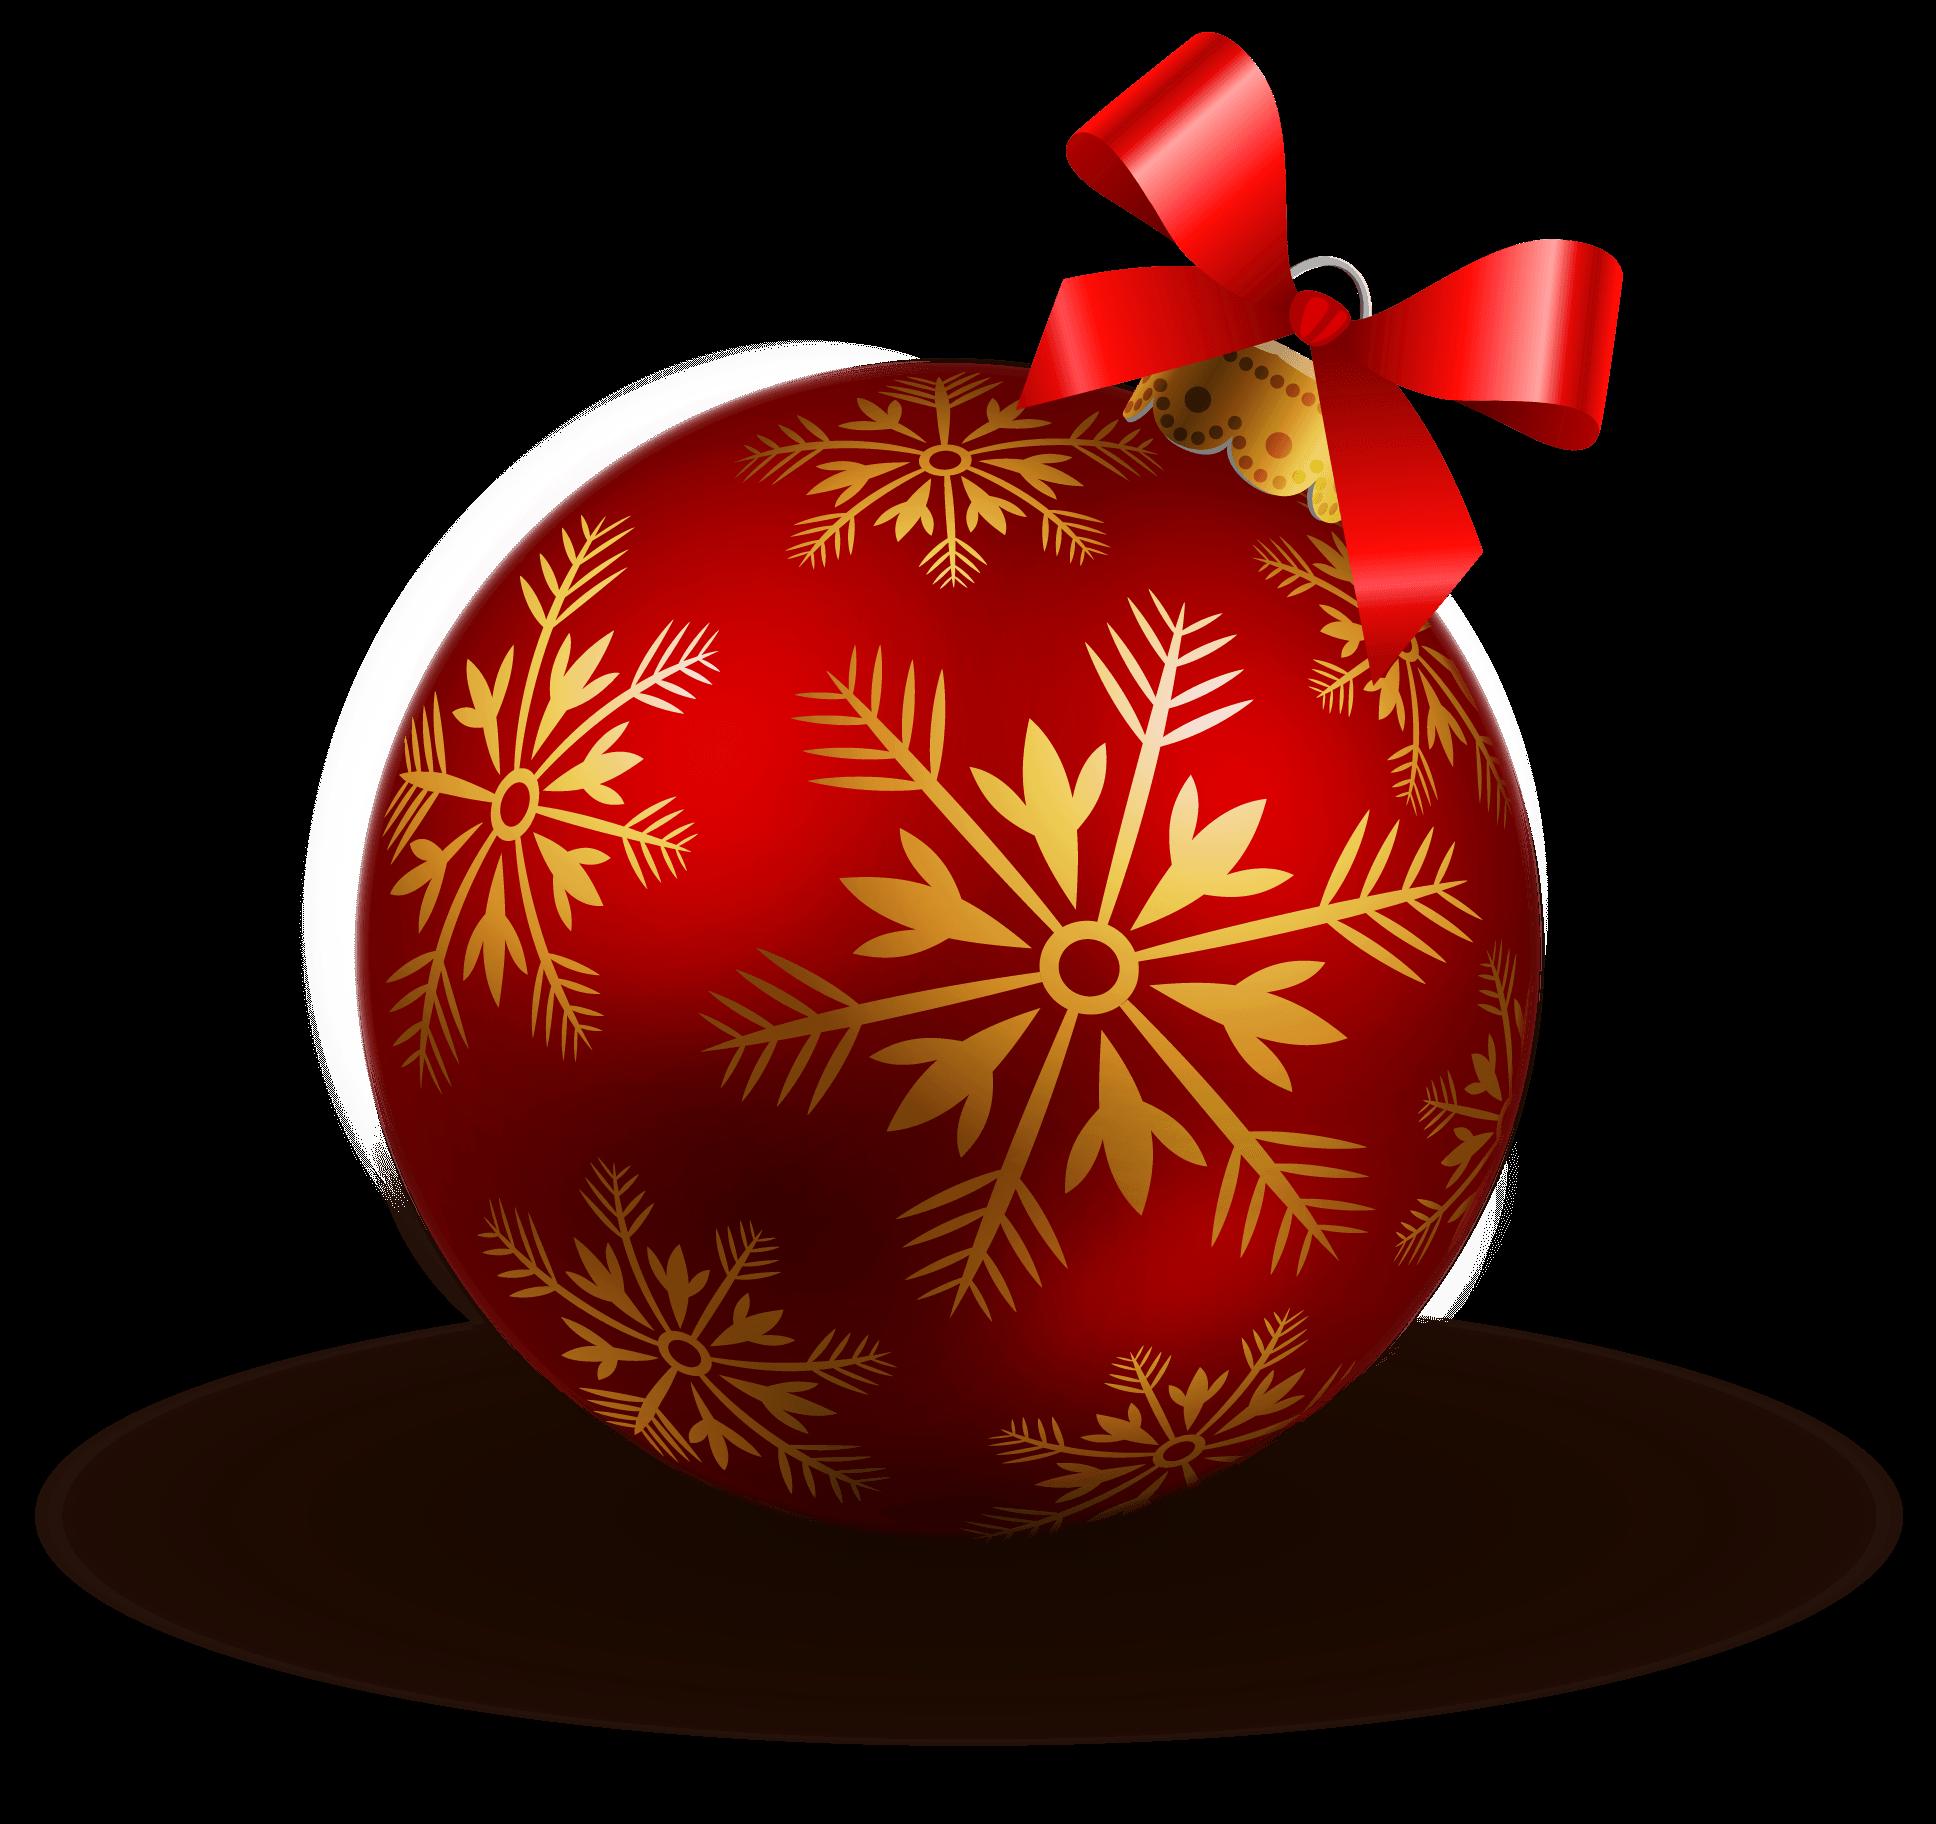 Transparent christmas ornaments tumblr